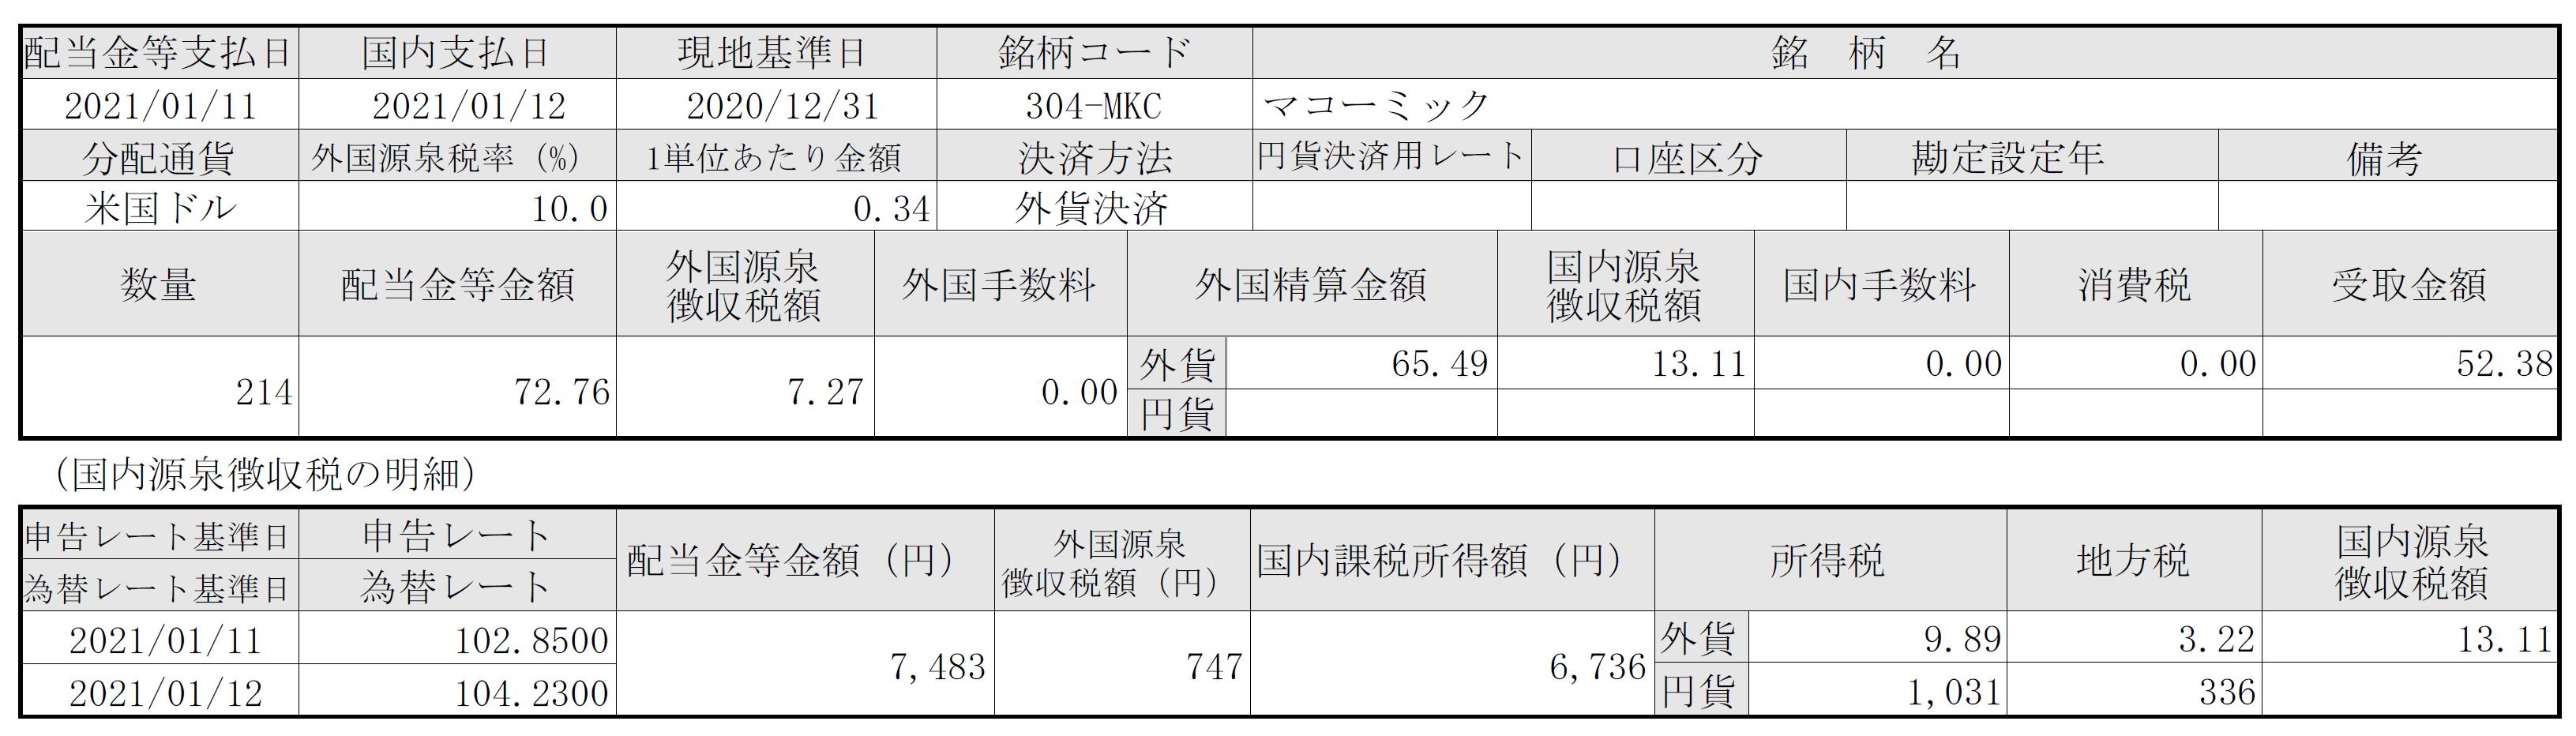 f:id:hodo-work:20210117184338p:plain